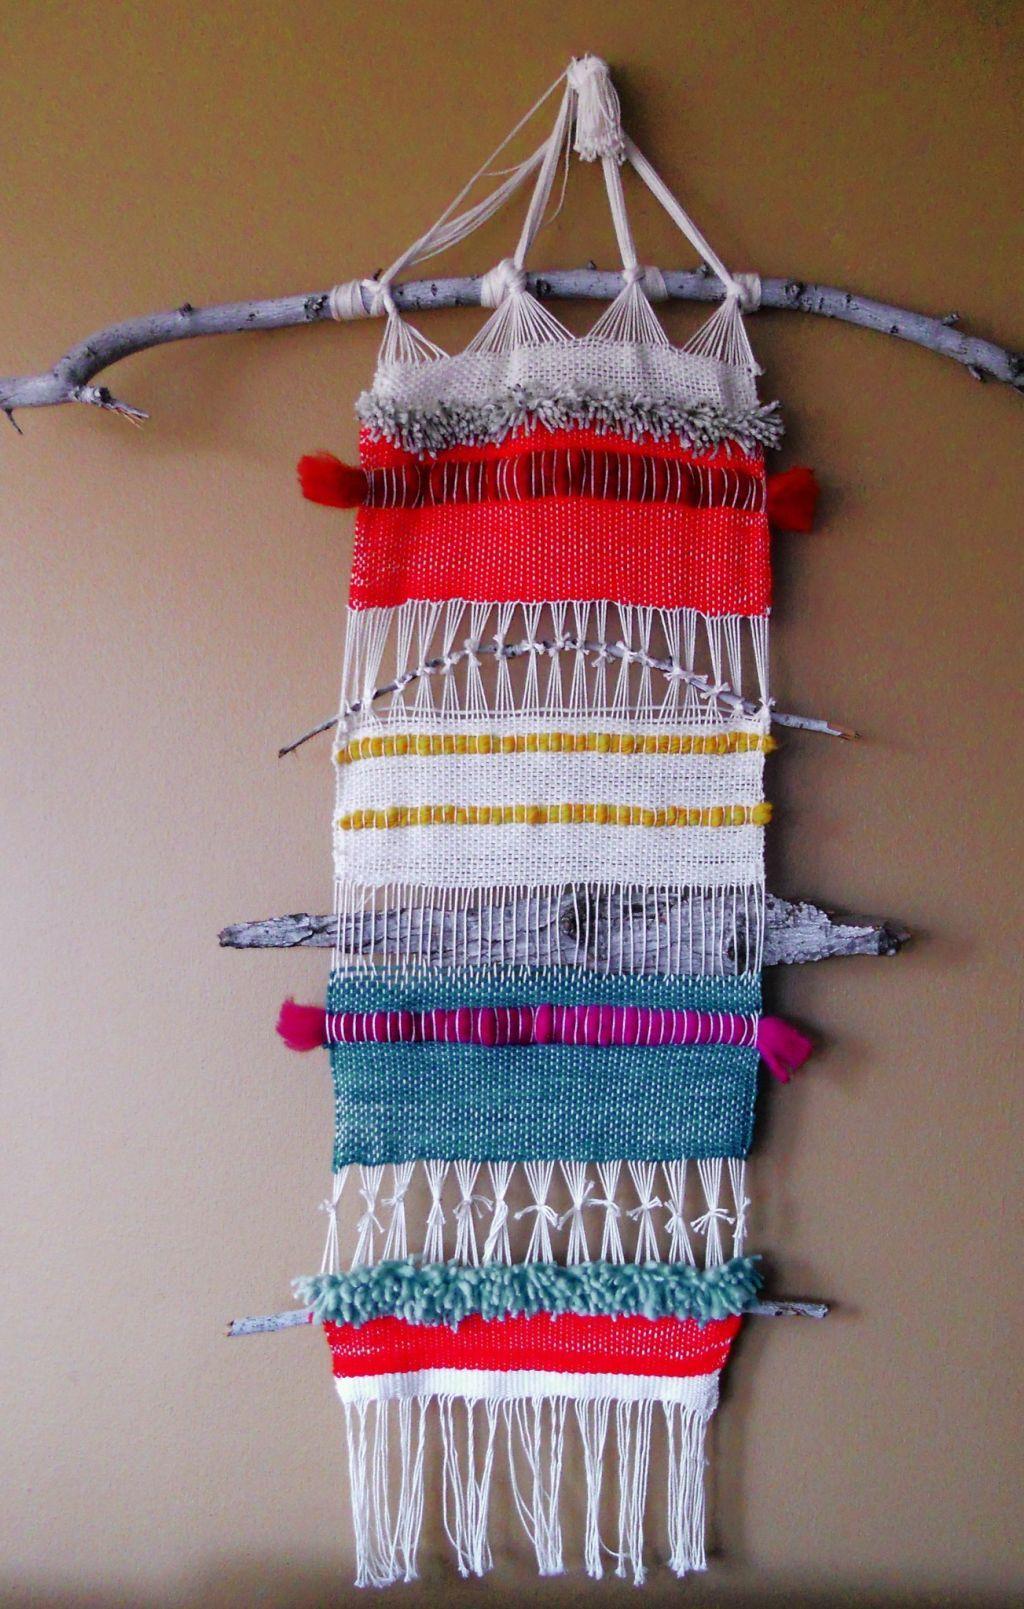 #weaving #diyweaving #weavinginspiration